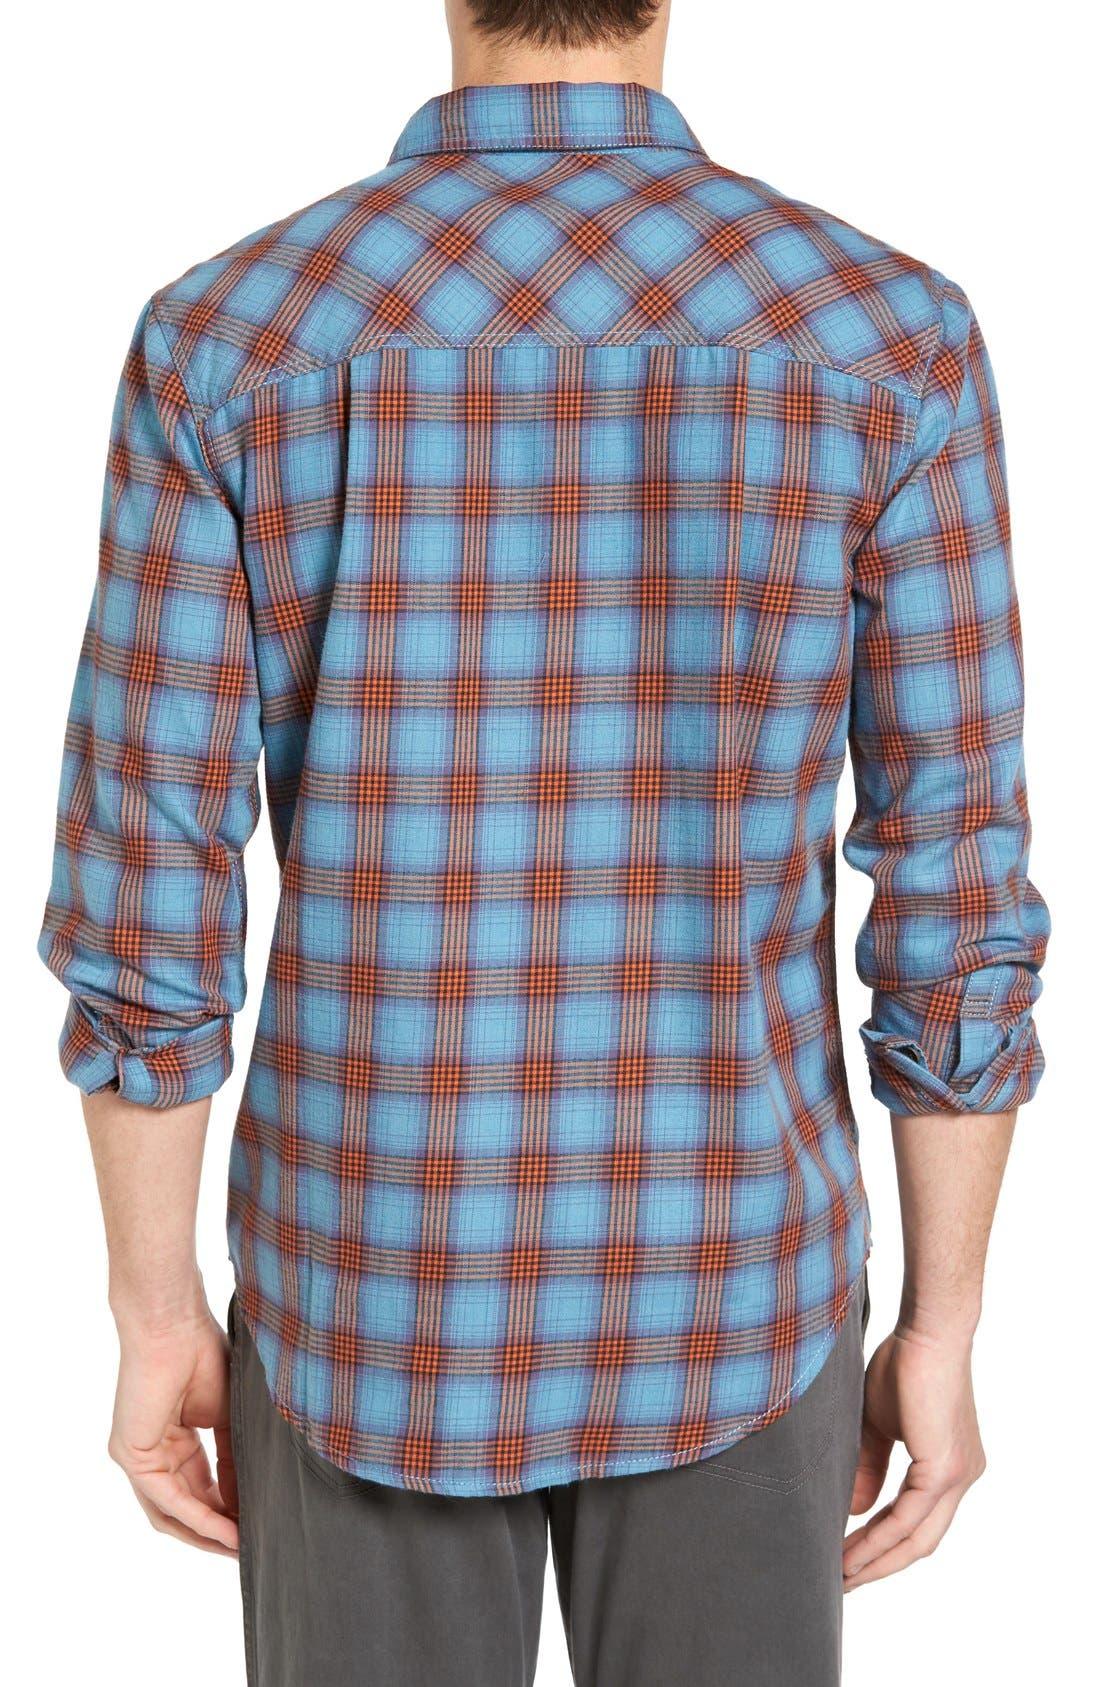 Burner Regular Fit Plaid Flannel Shirt,                             Alternate thumbnail 10, color,                             401